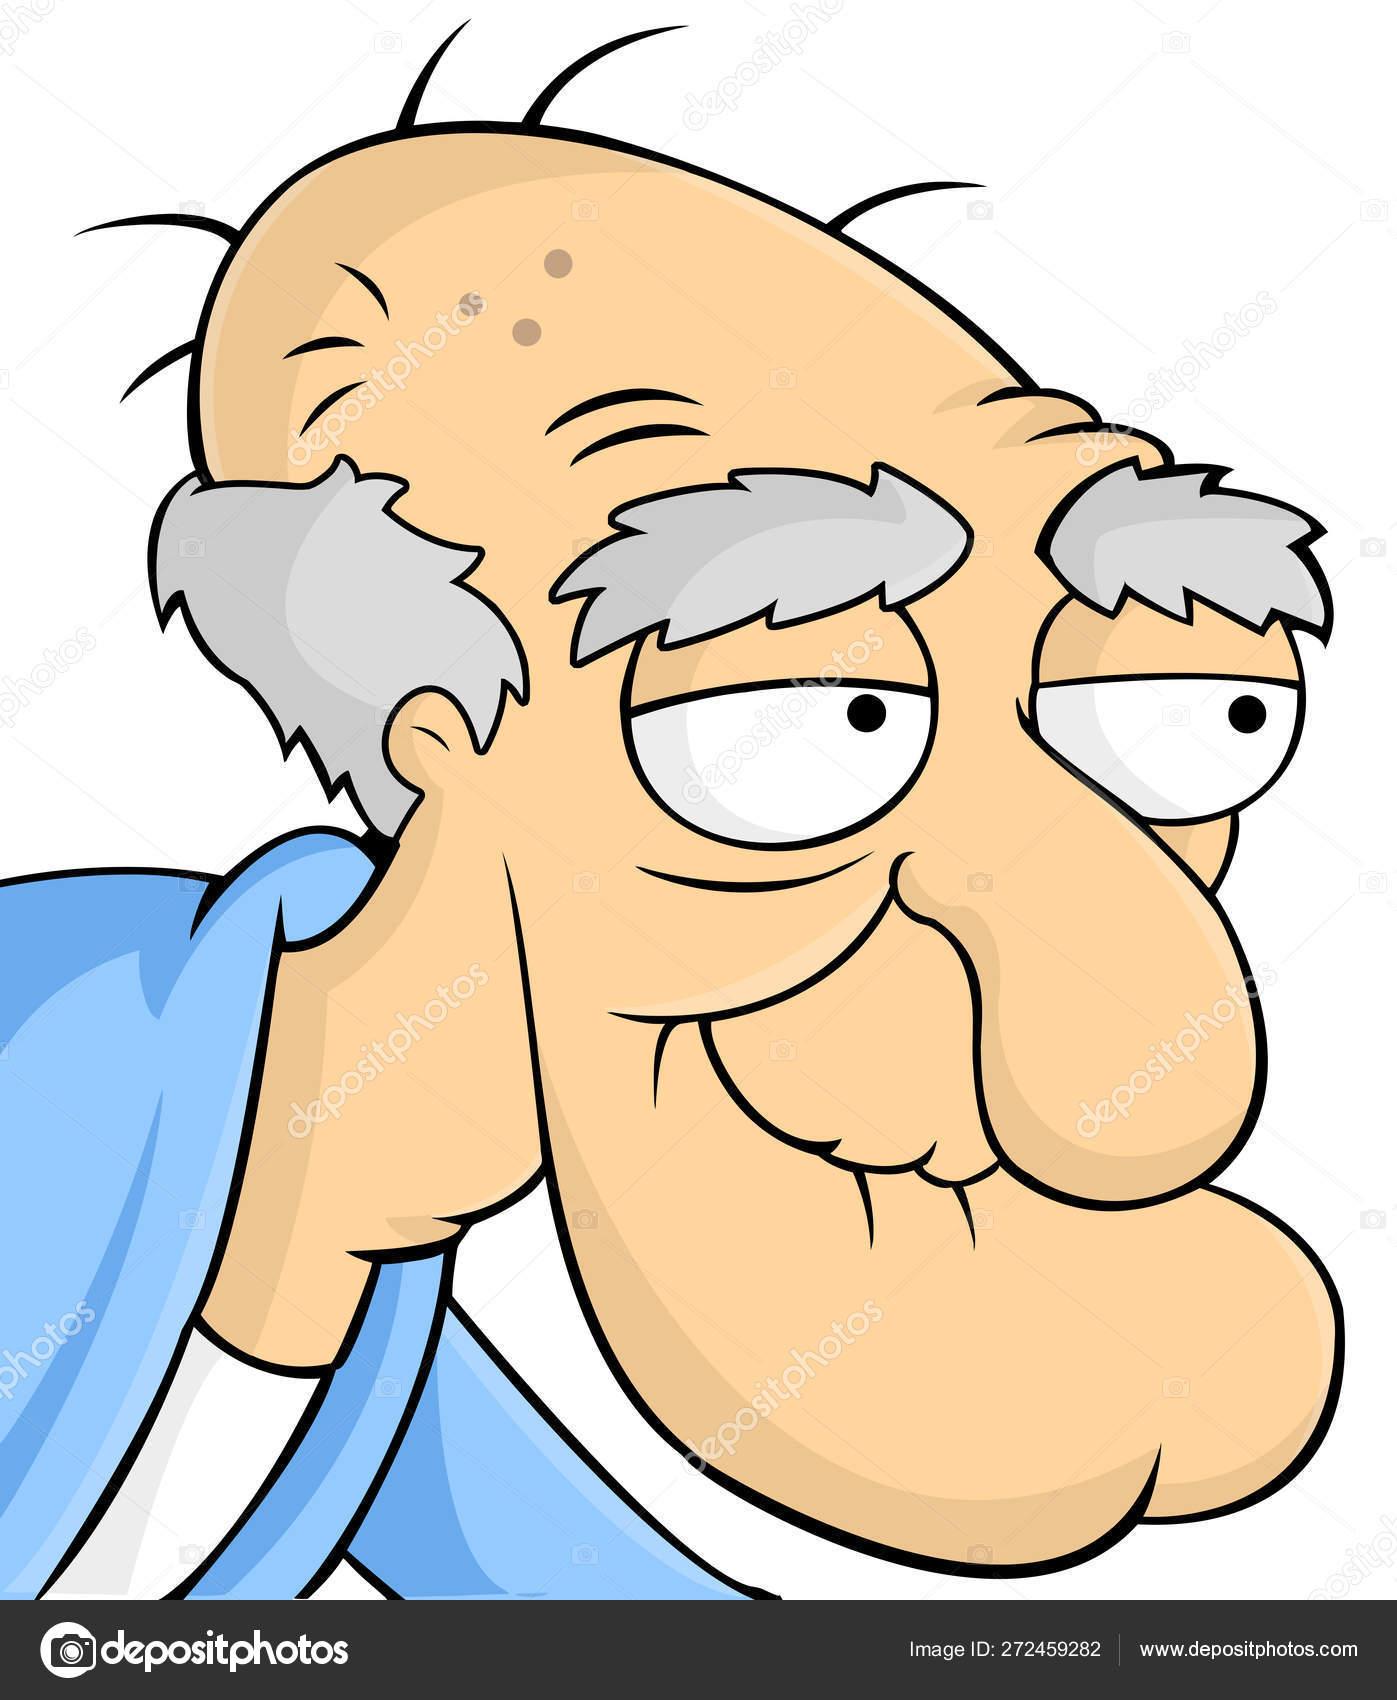 Herbert Family Guy Illustration Character Cartoon Stock Editorial Photo C Chutimakuanamon 272459282